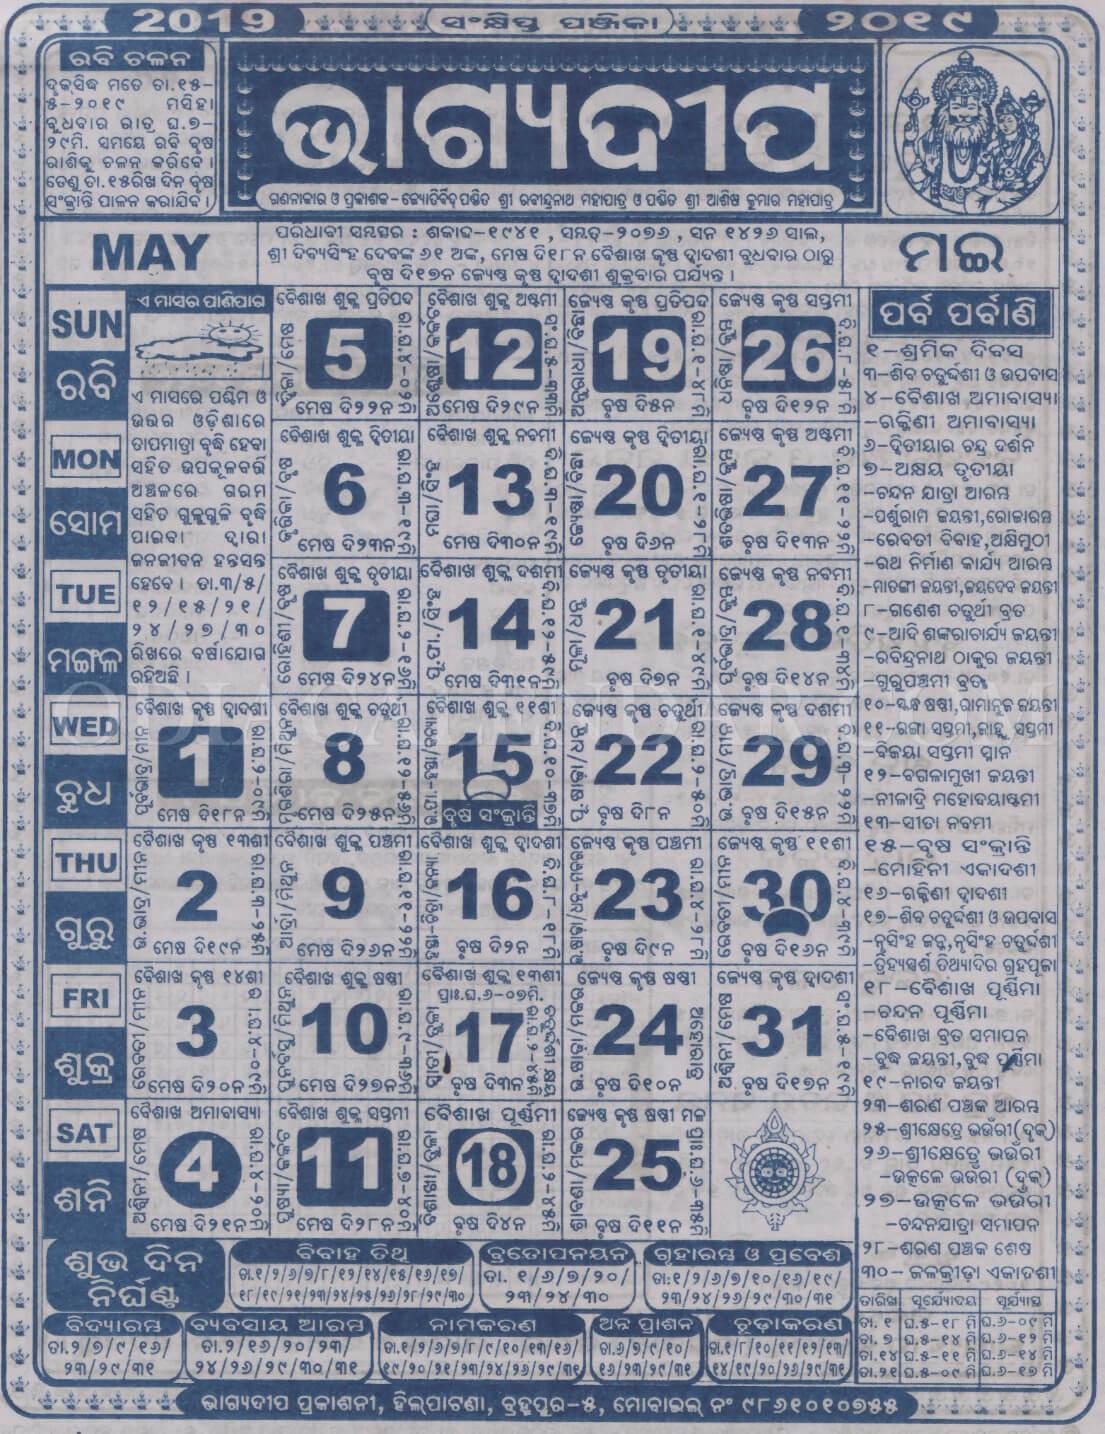 Odia Bhagyadeep Calendar 2020 May View And Download Free regarding Bhagyadeep Odia Calendar 2020